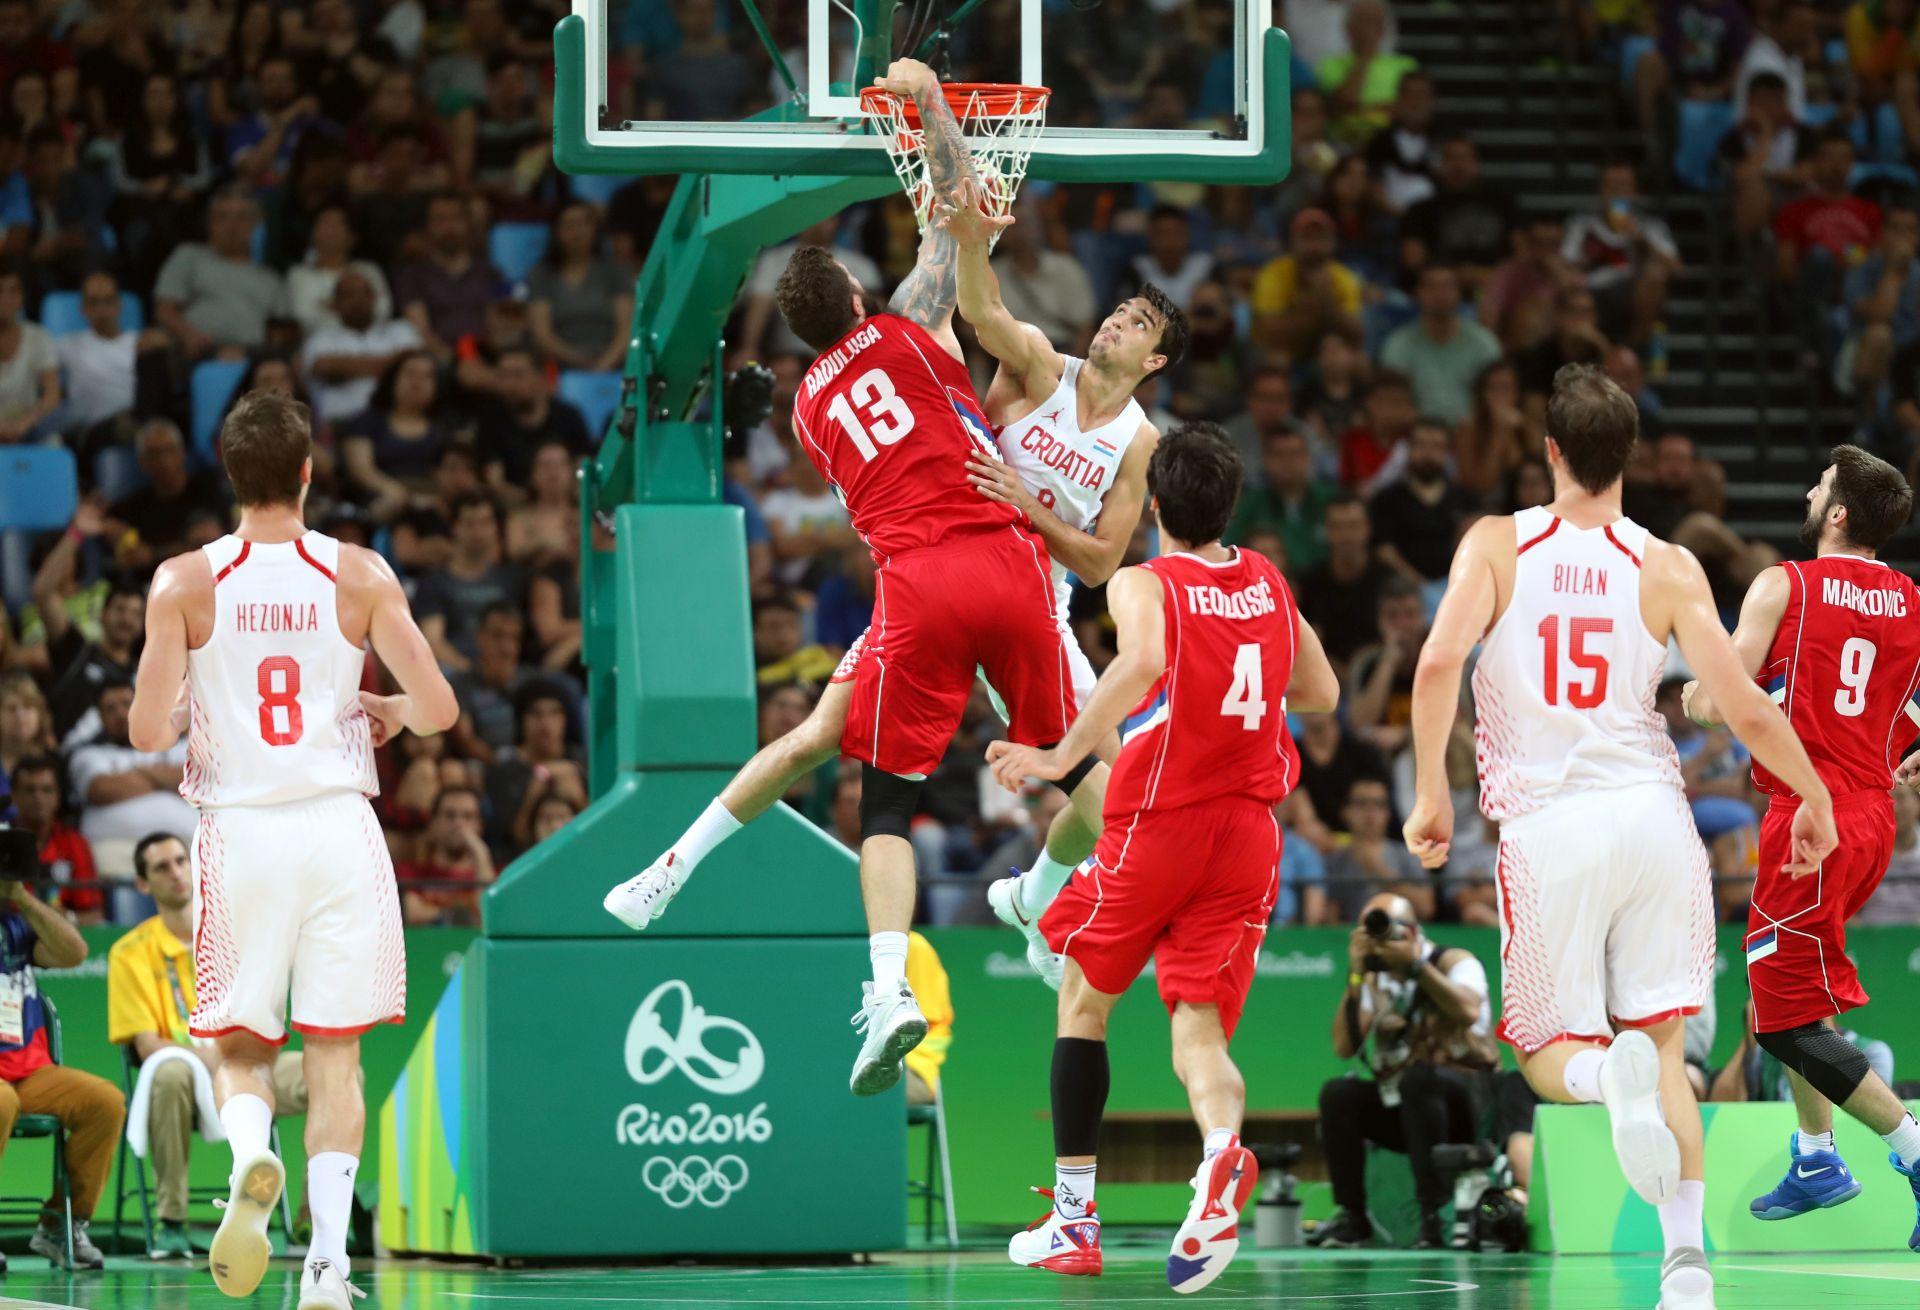 OI Rio: Hrvatska – Srbija 83-86